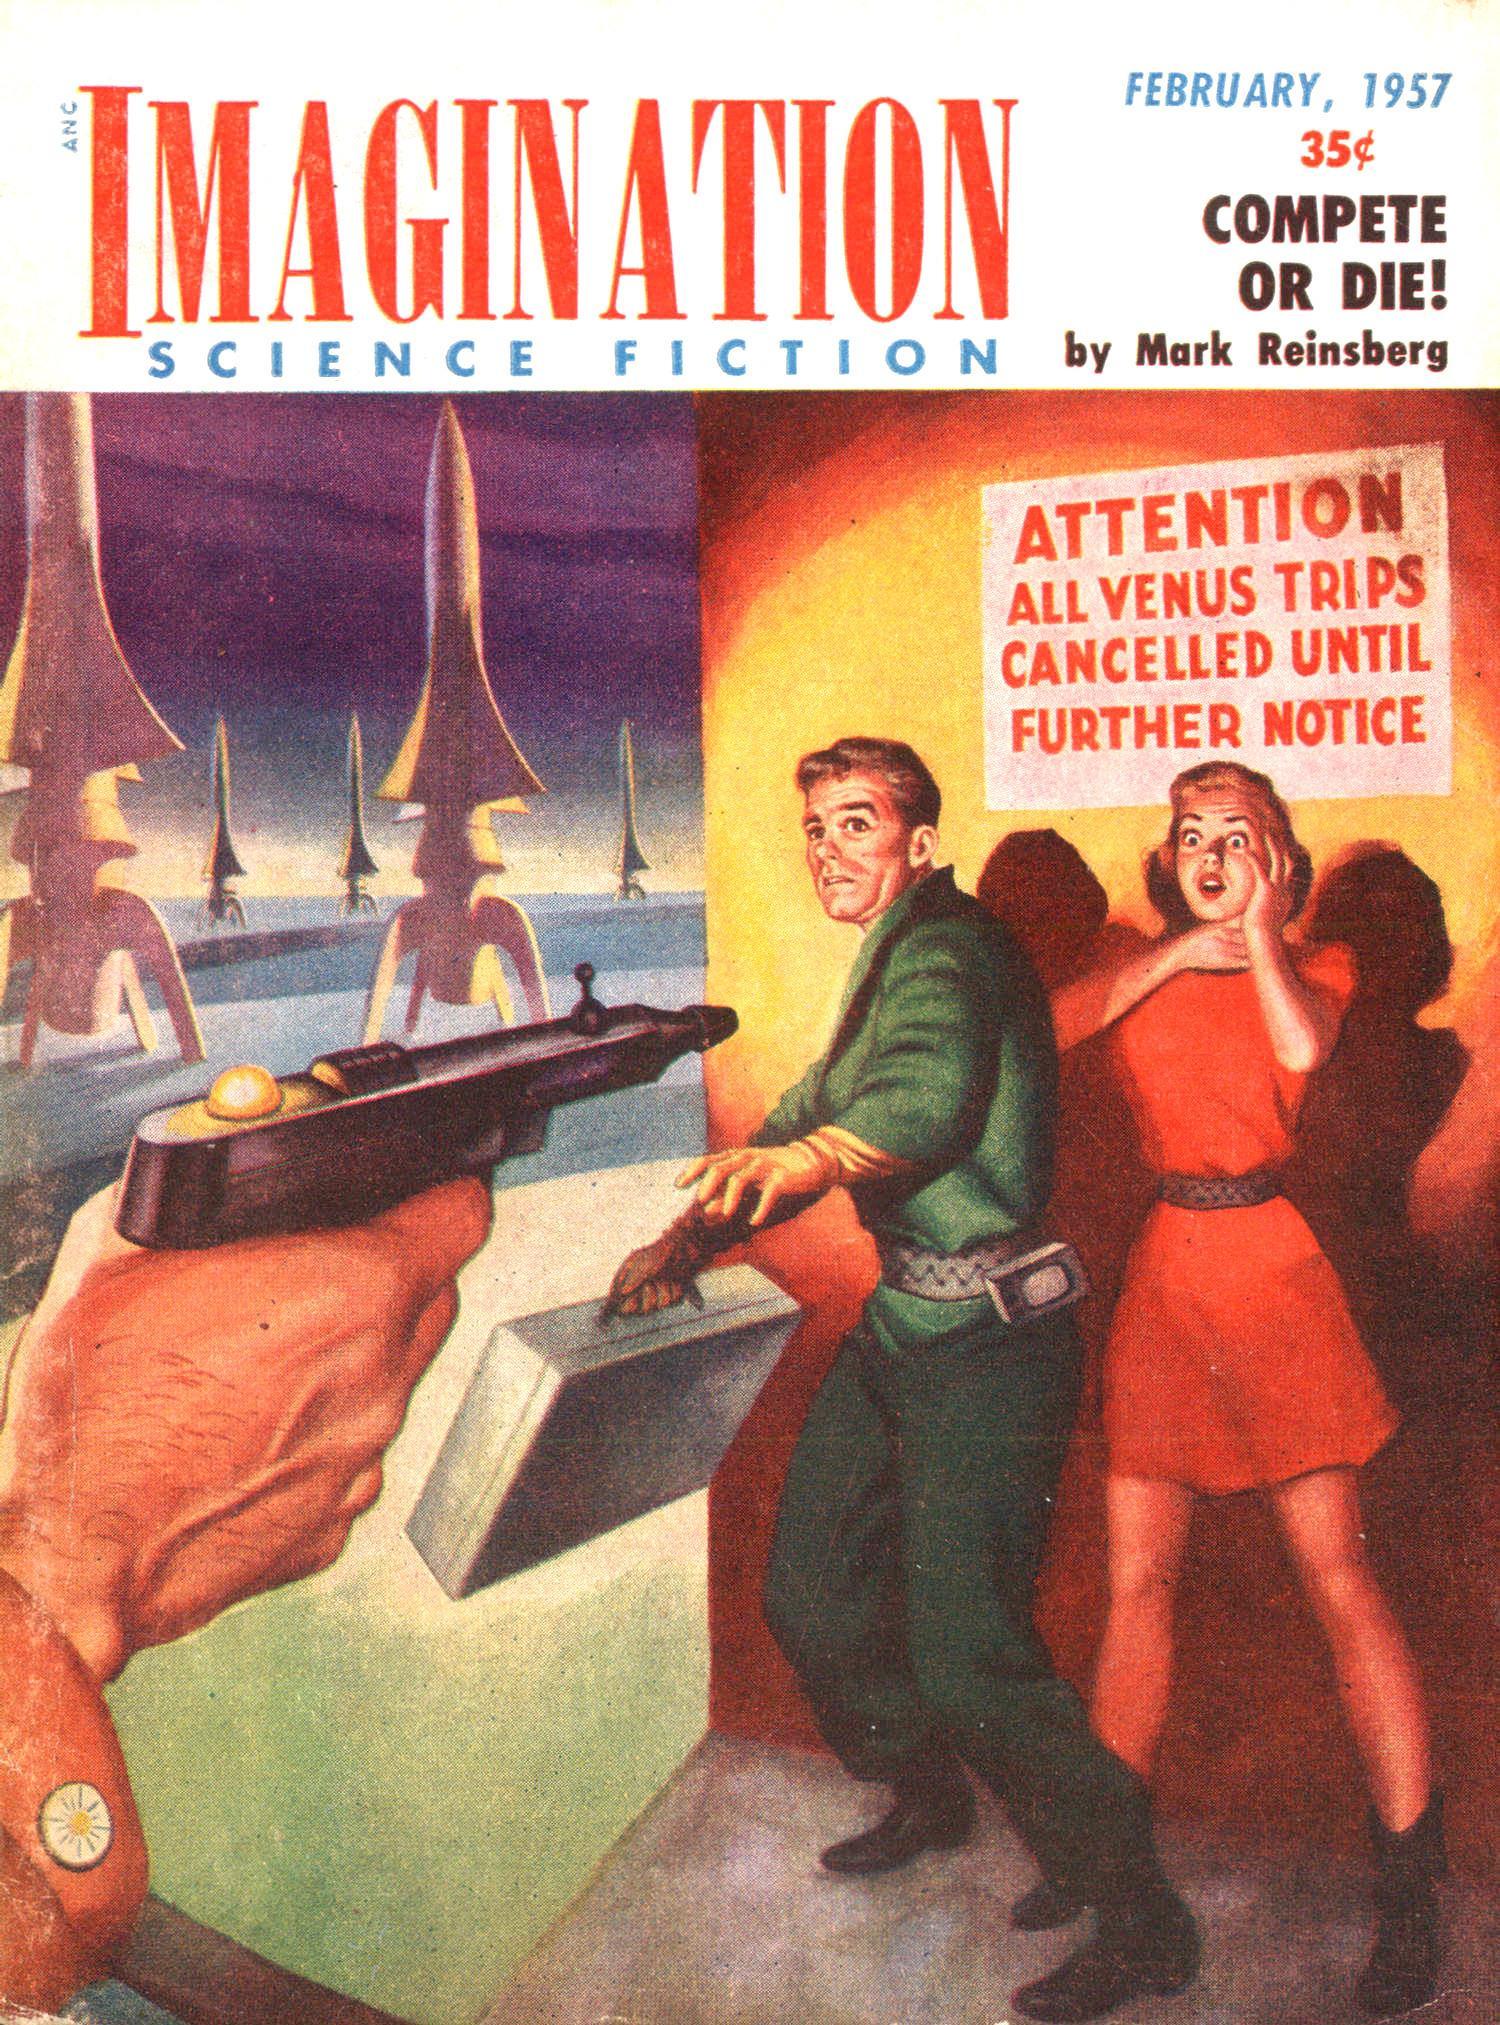 Imagination, February 1957